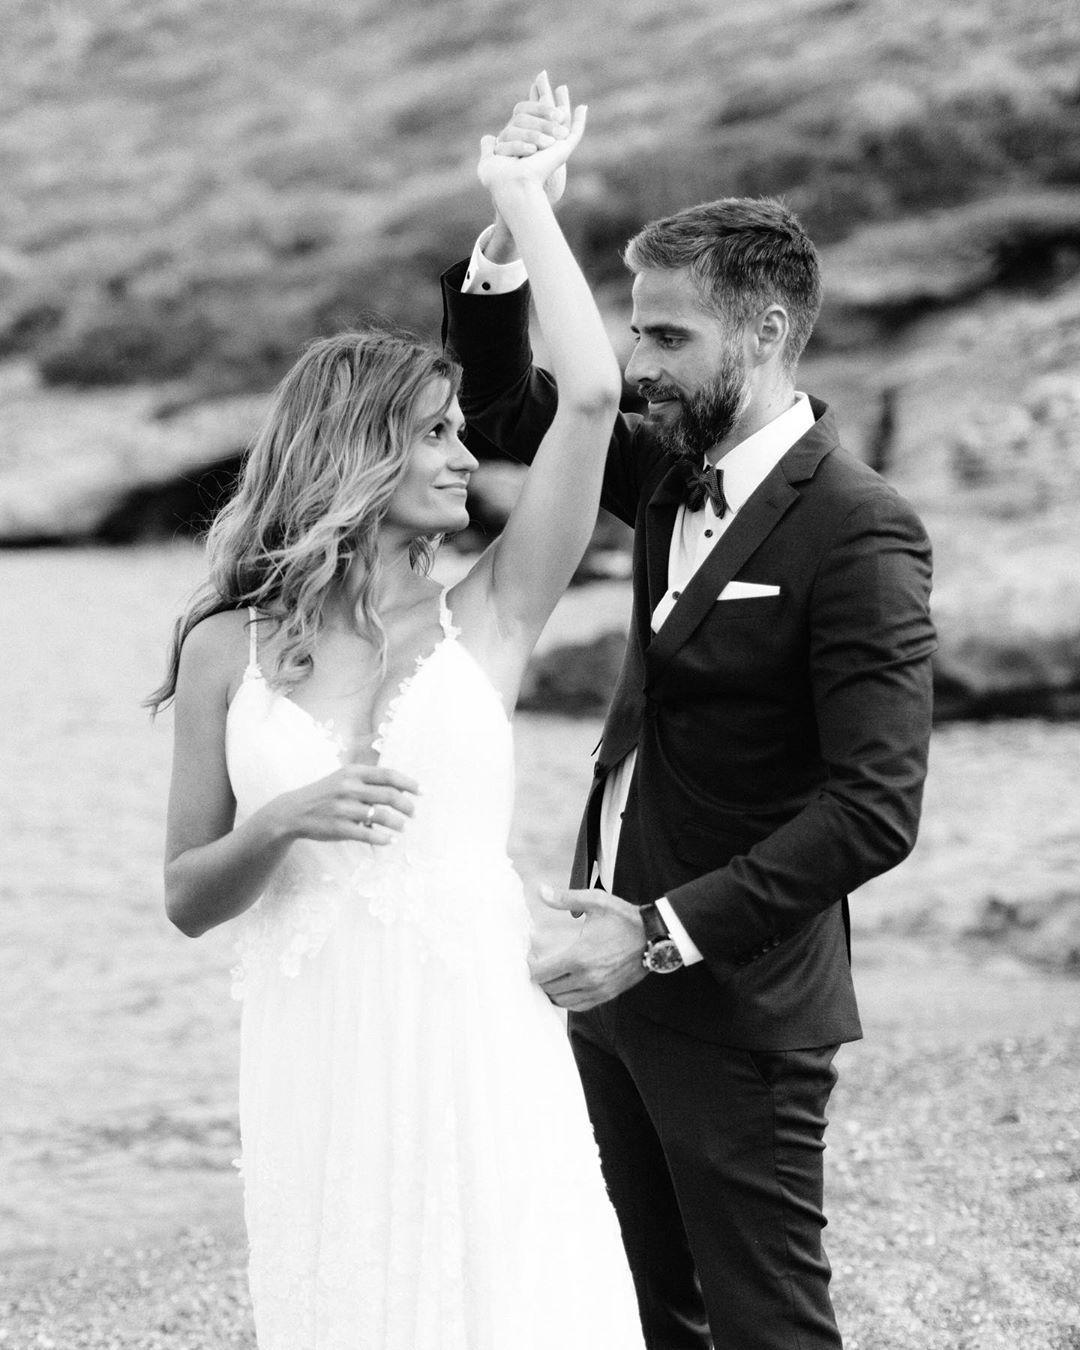 rencontre serieuse gay wedding ring a La Possession